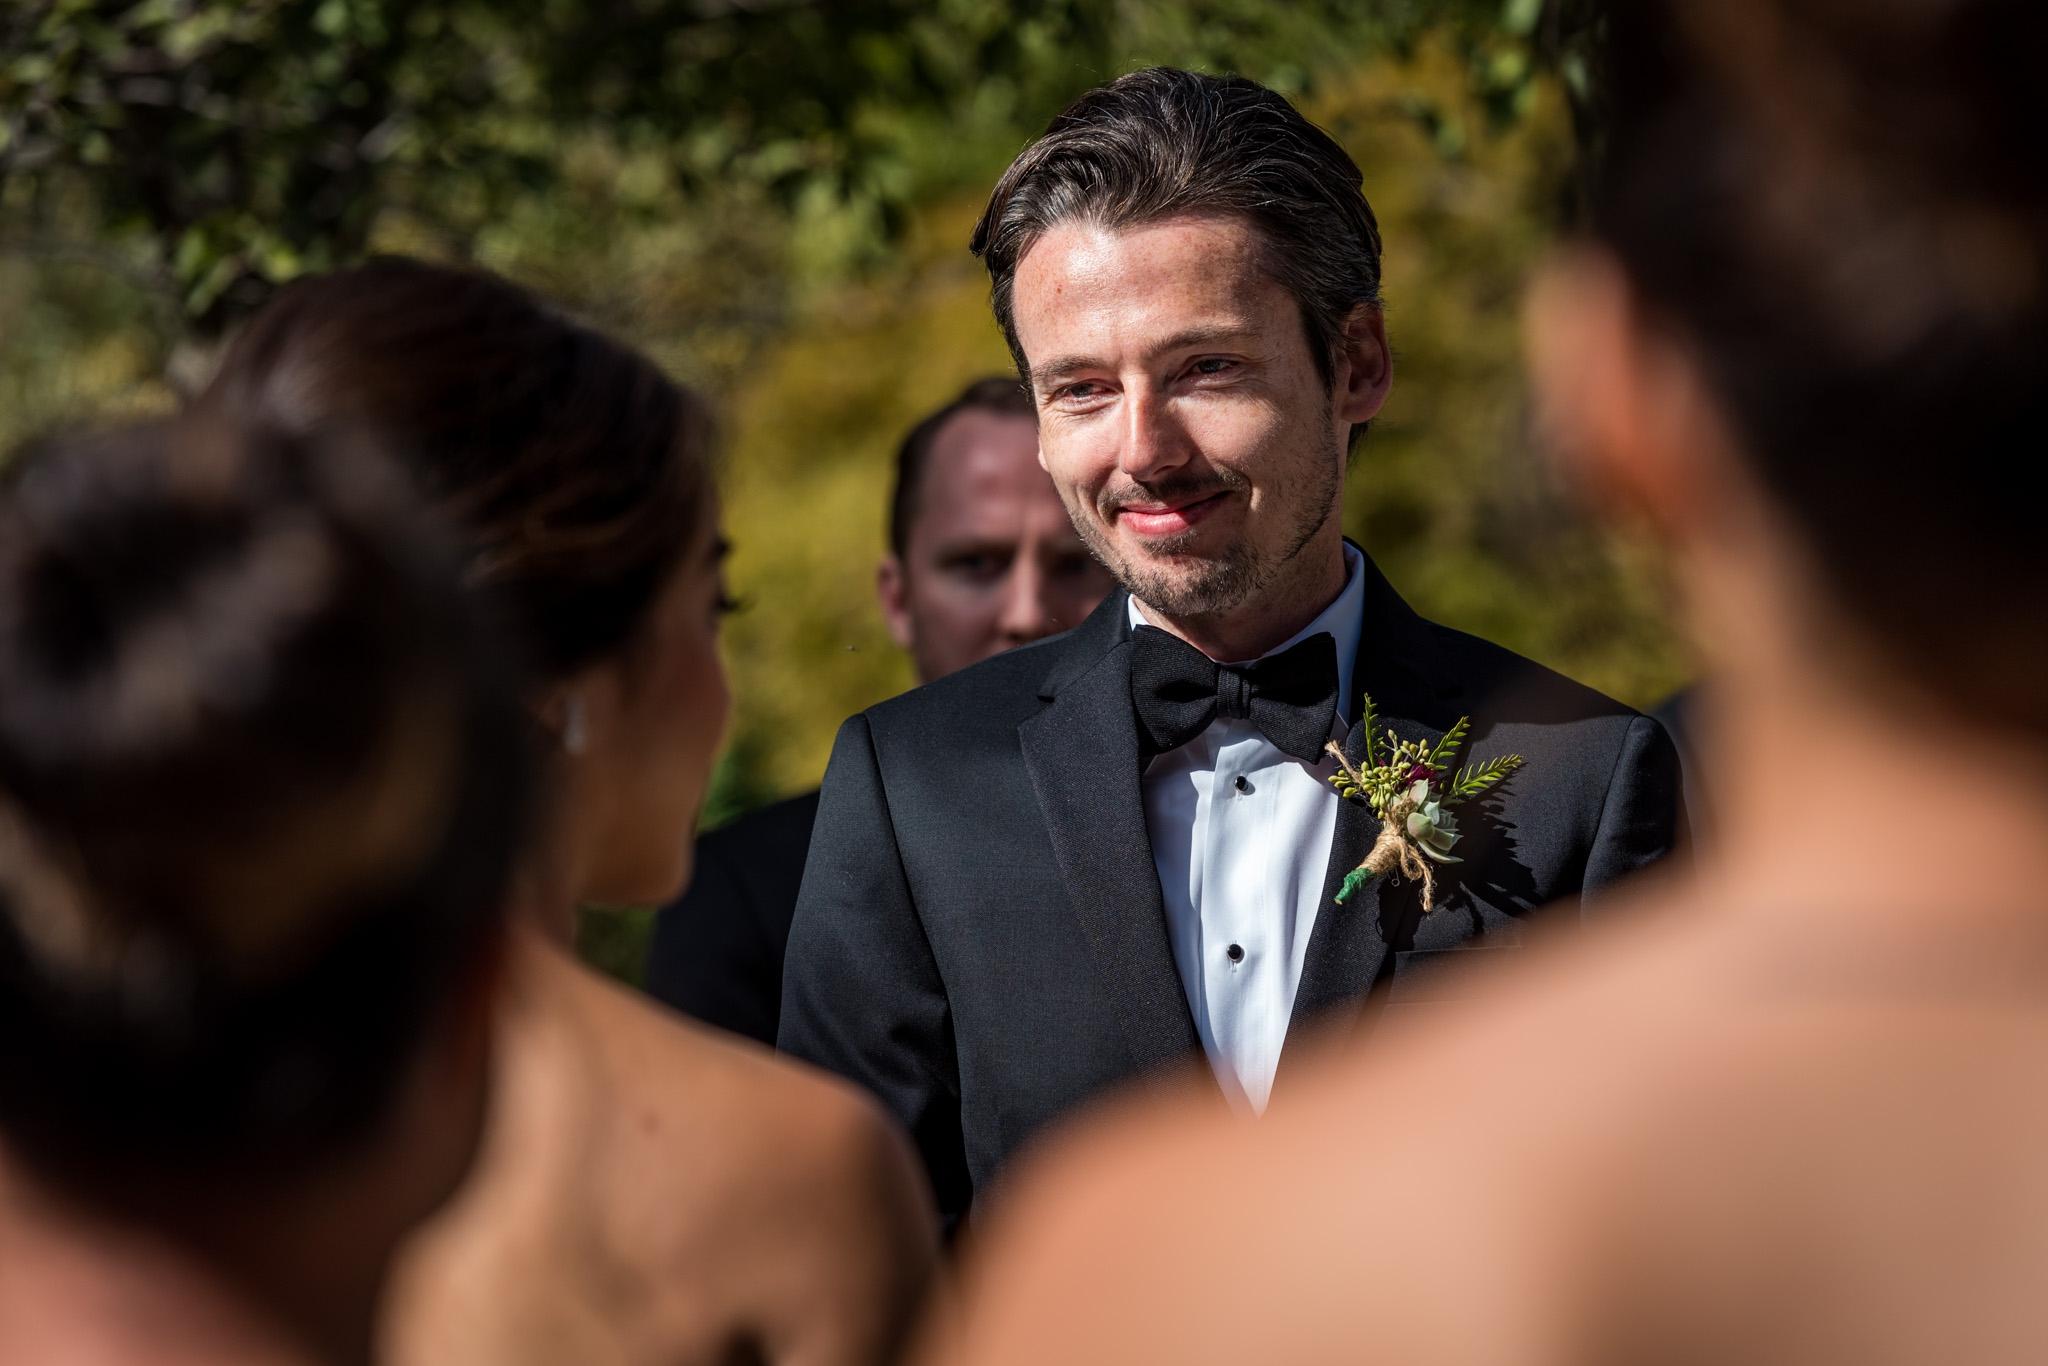 Lancy-Adam-Groom-Ceremony-Wedding-Hakone-Saratoga-Satvedi-Photography